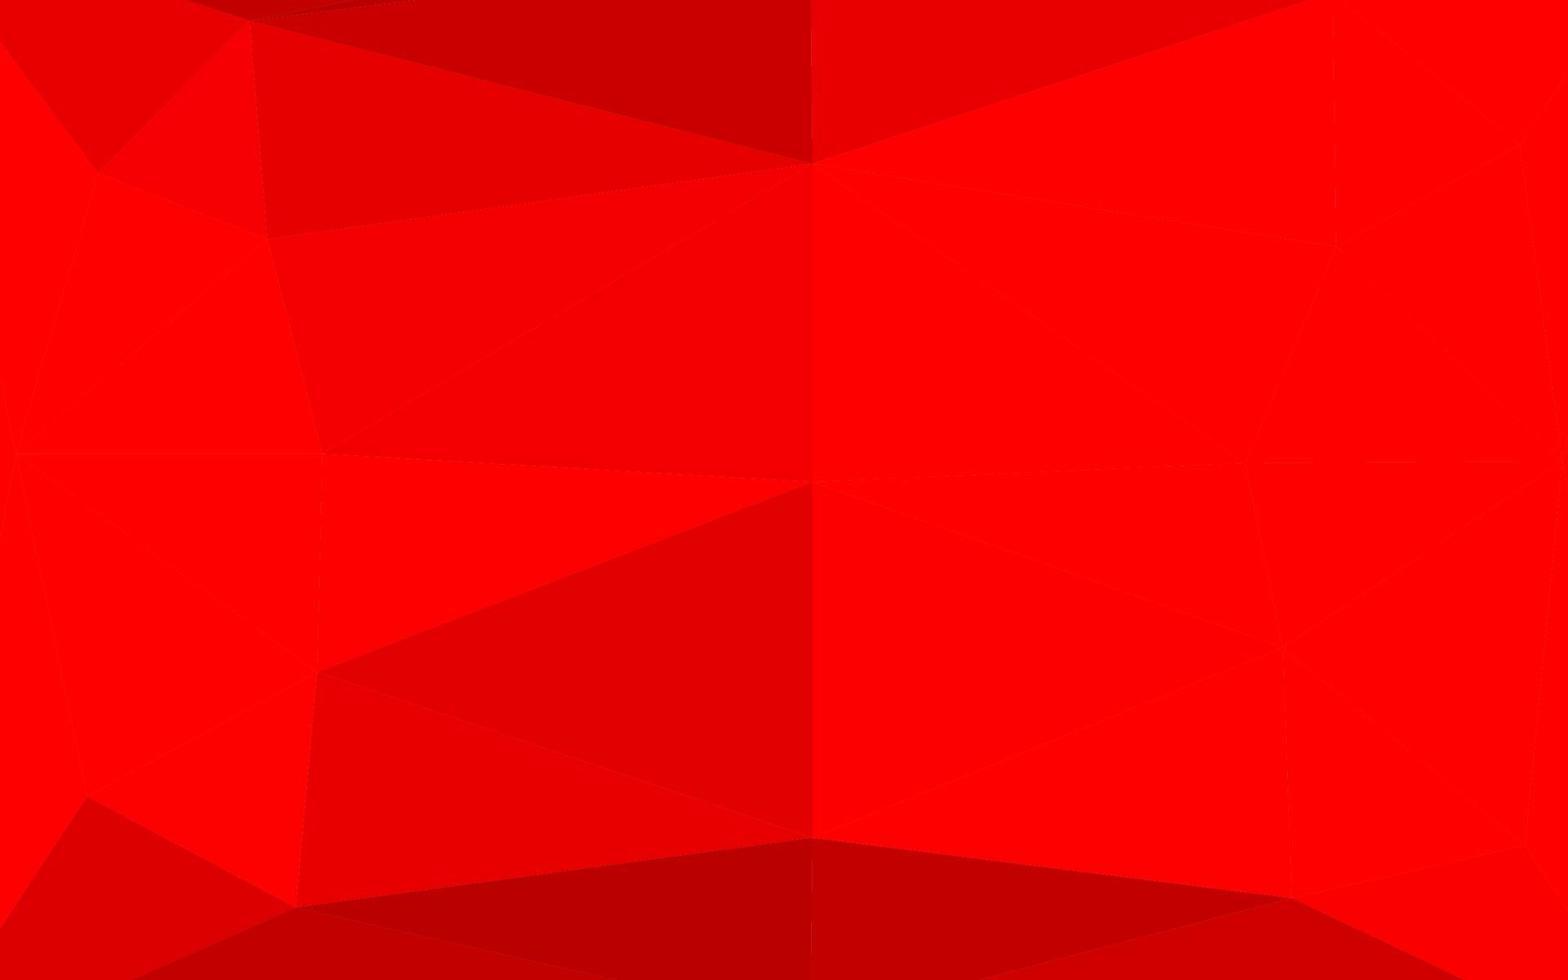 layout poligonal abstrato de vetor vermelho claro.